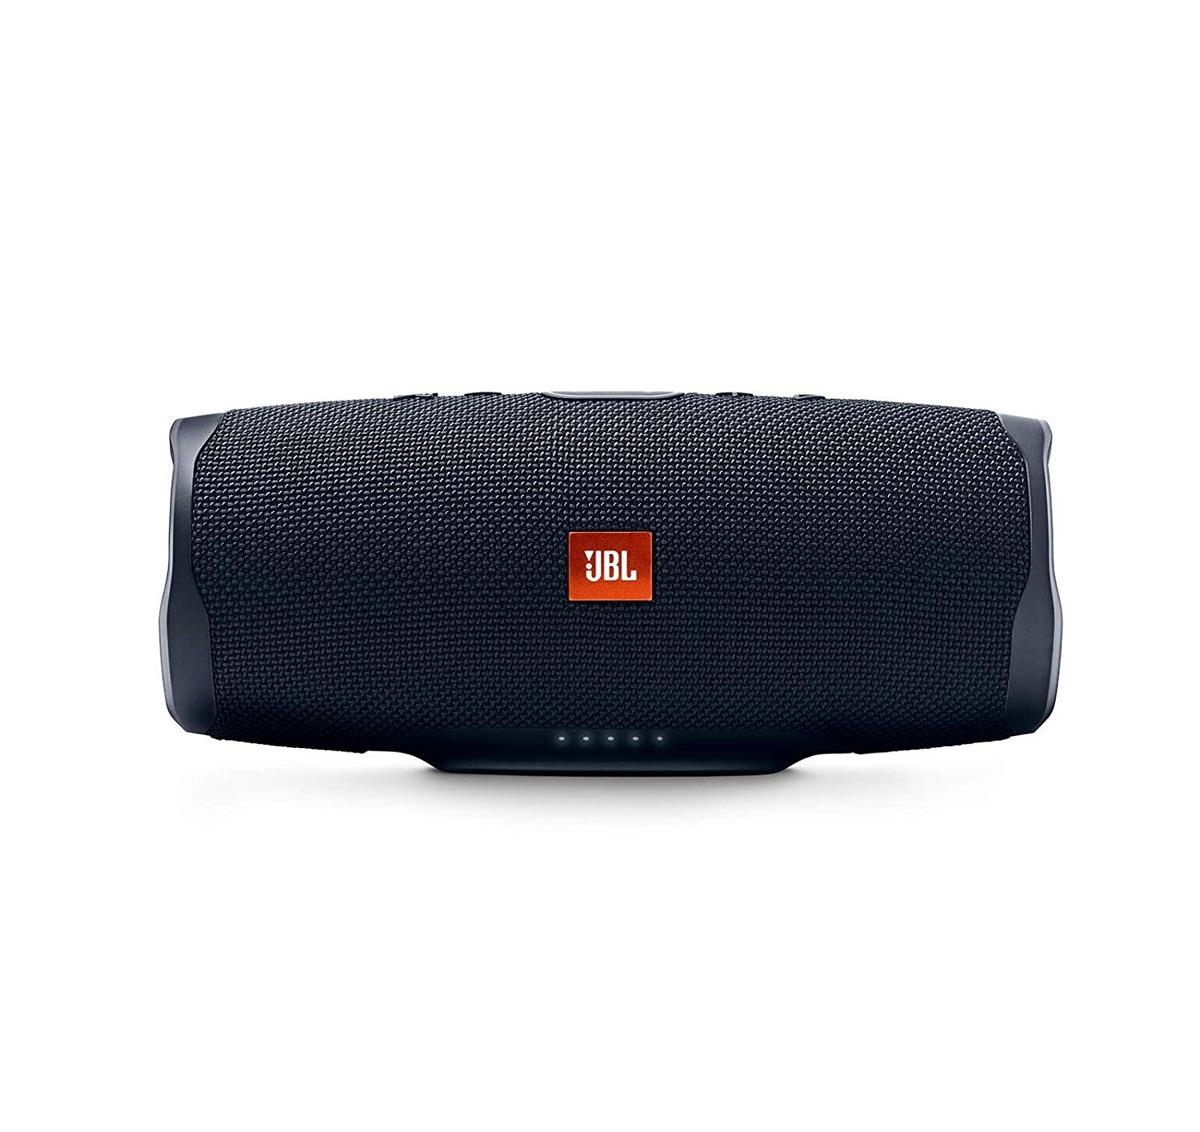 Black JBL speaker